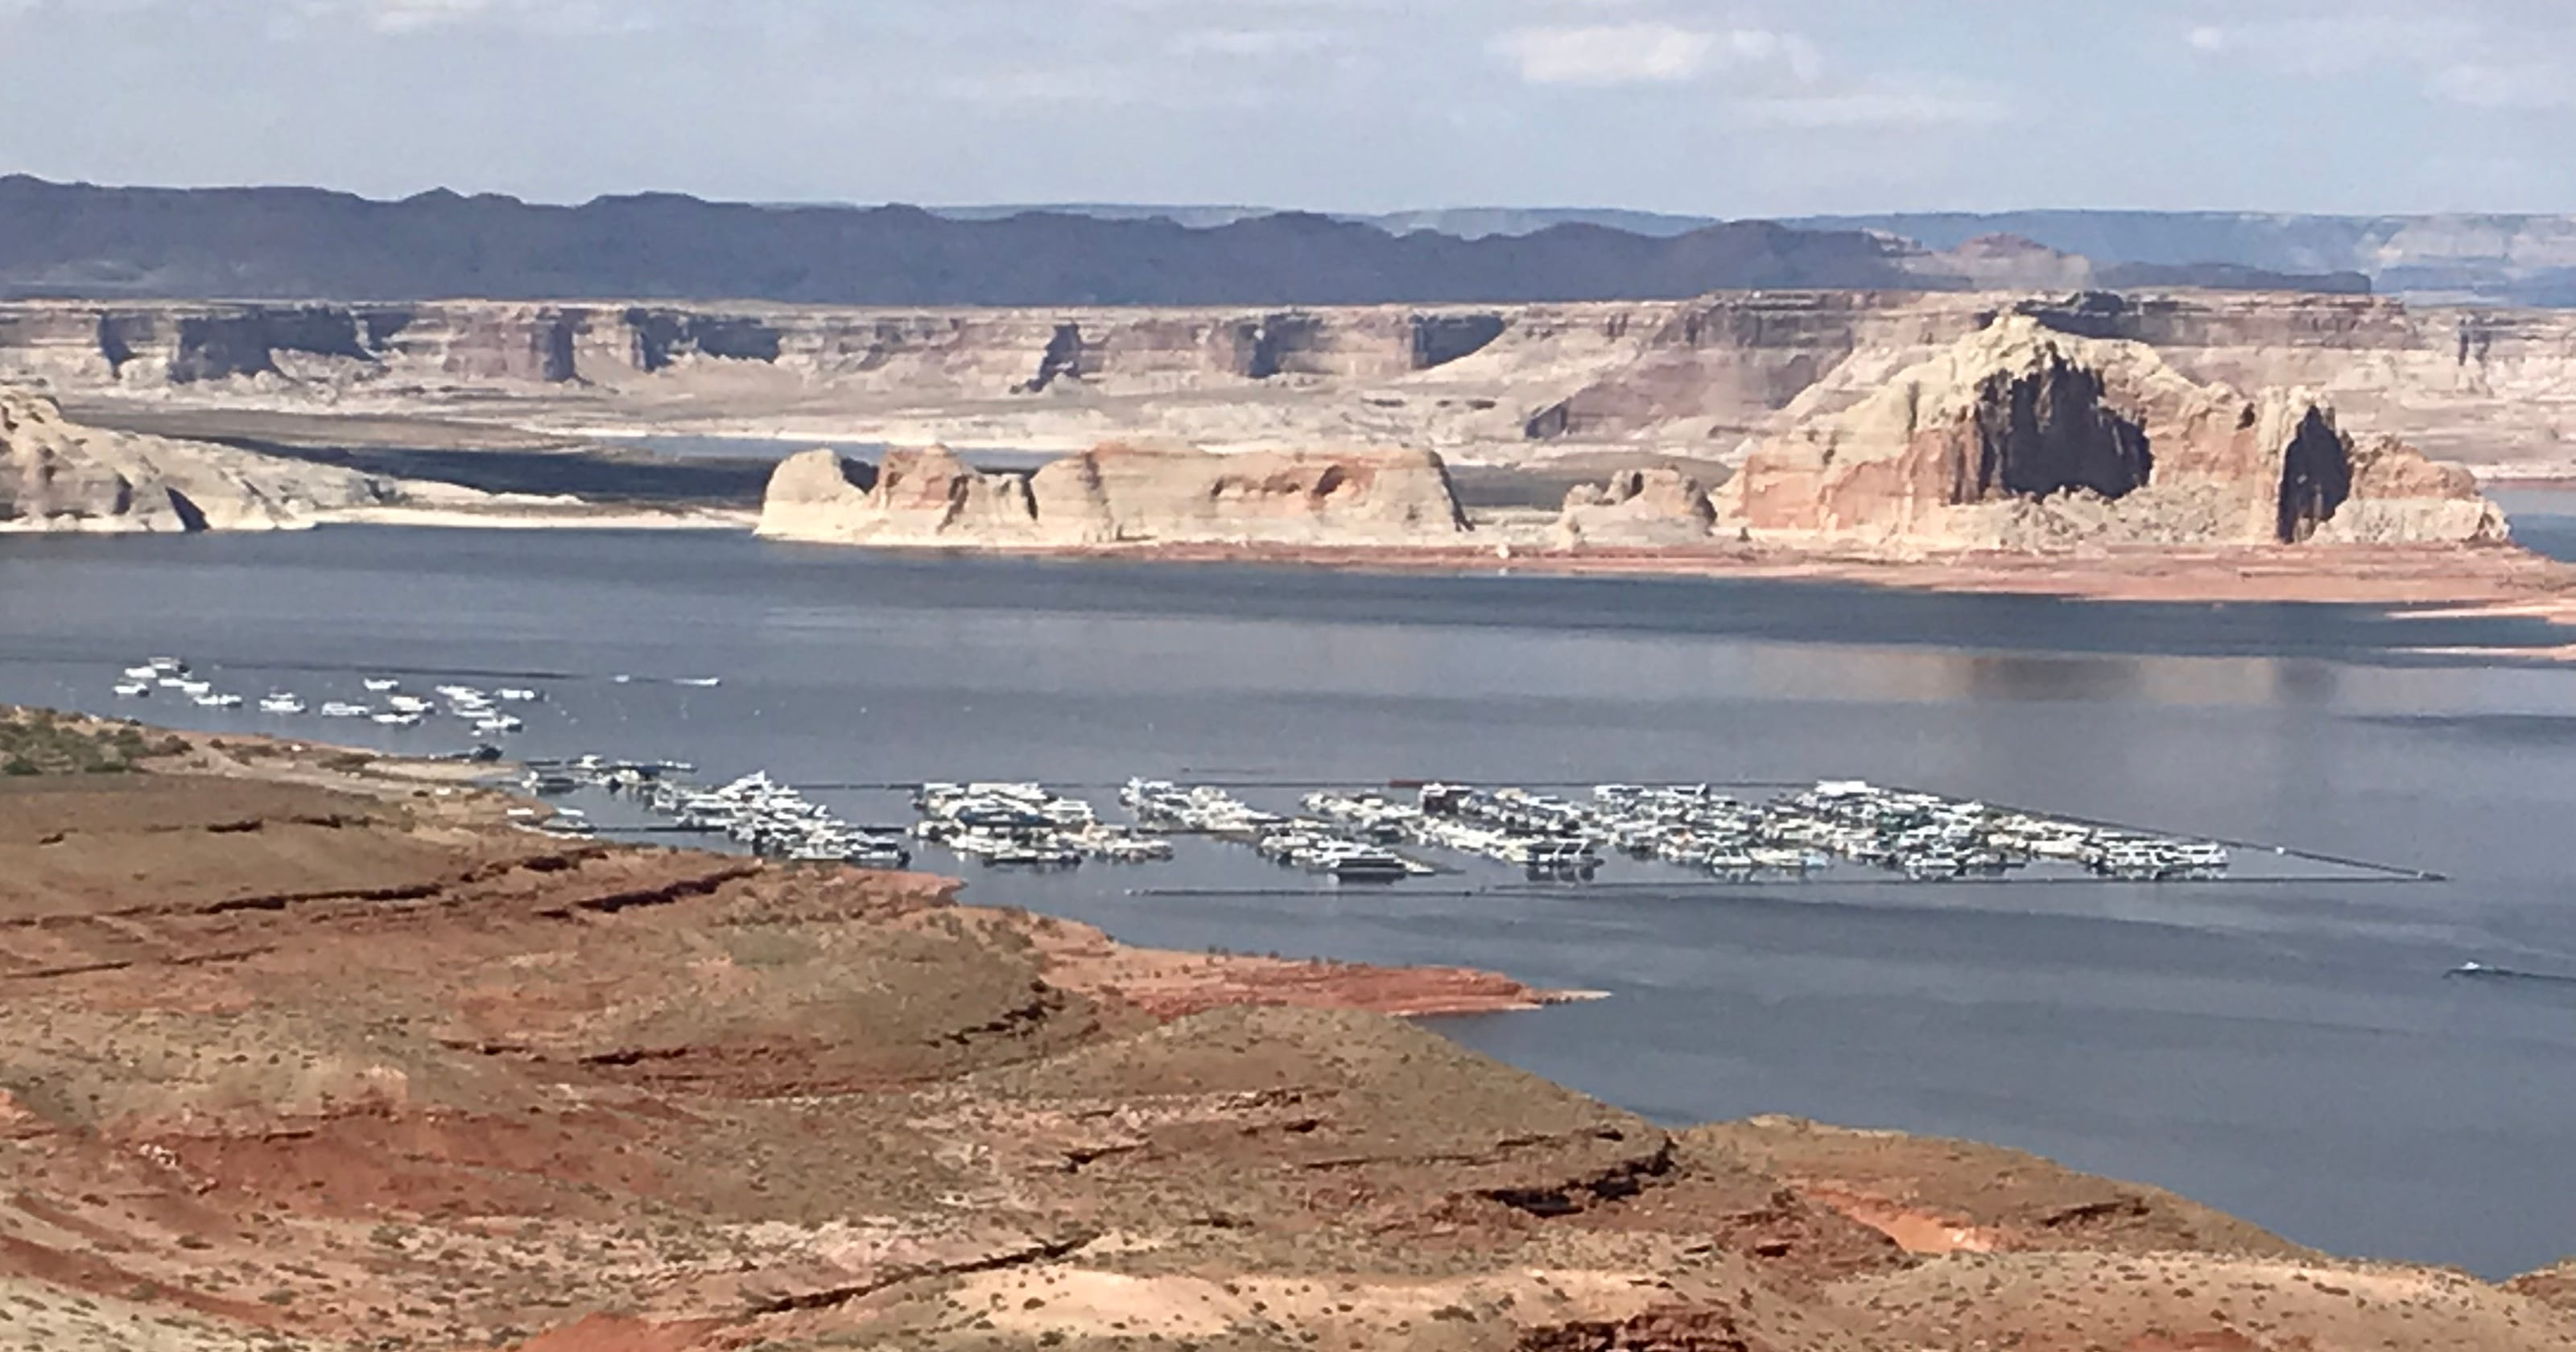 Scientists: Amid Colorado River crisis, the status quo is